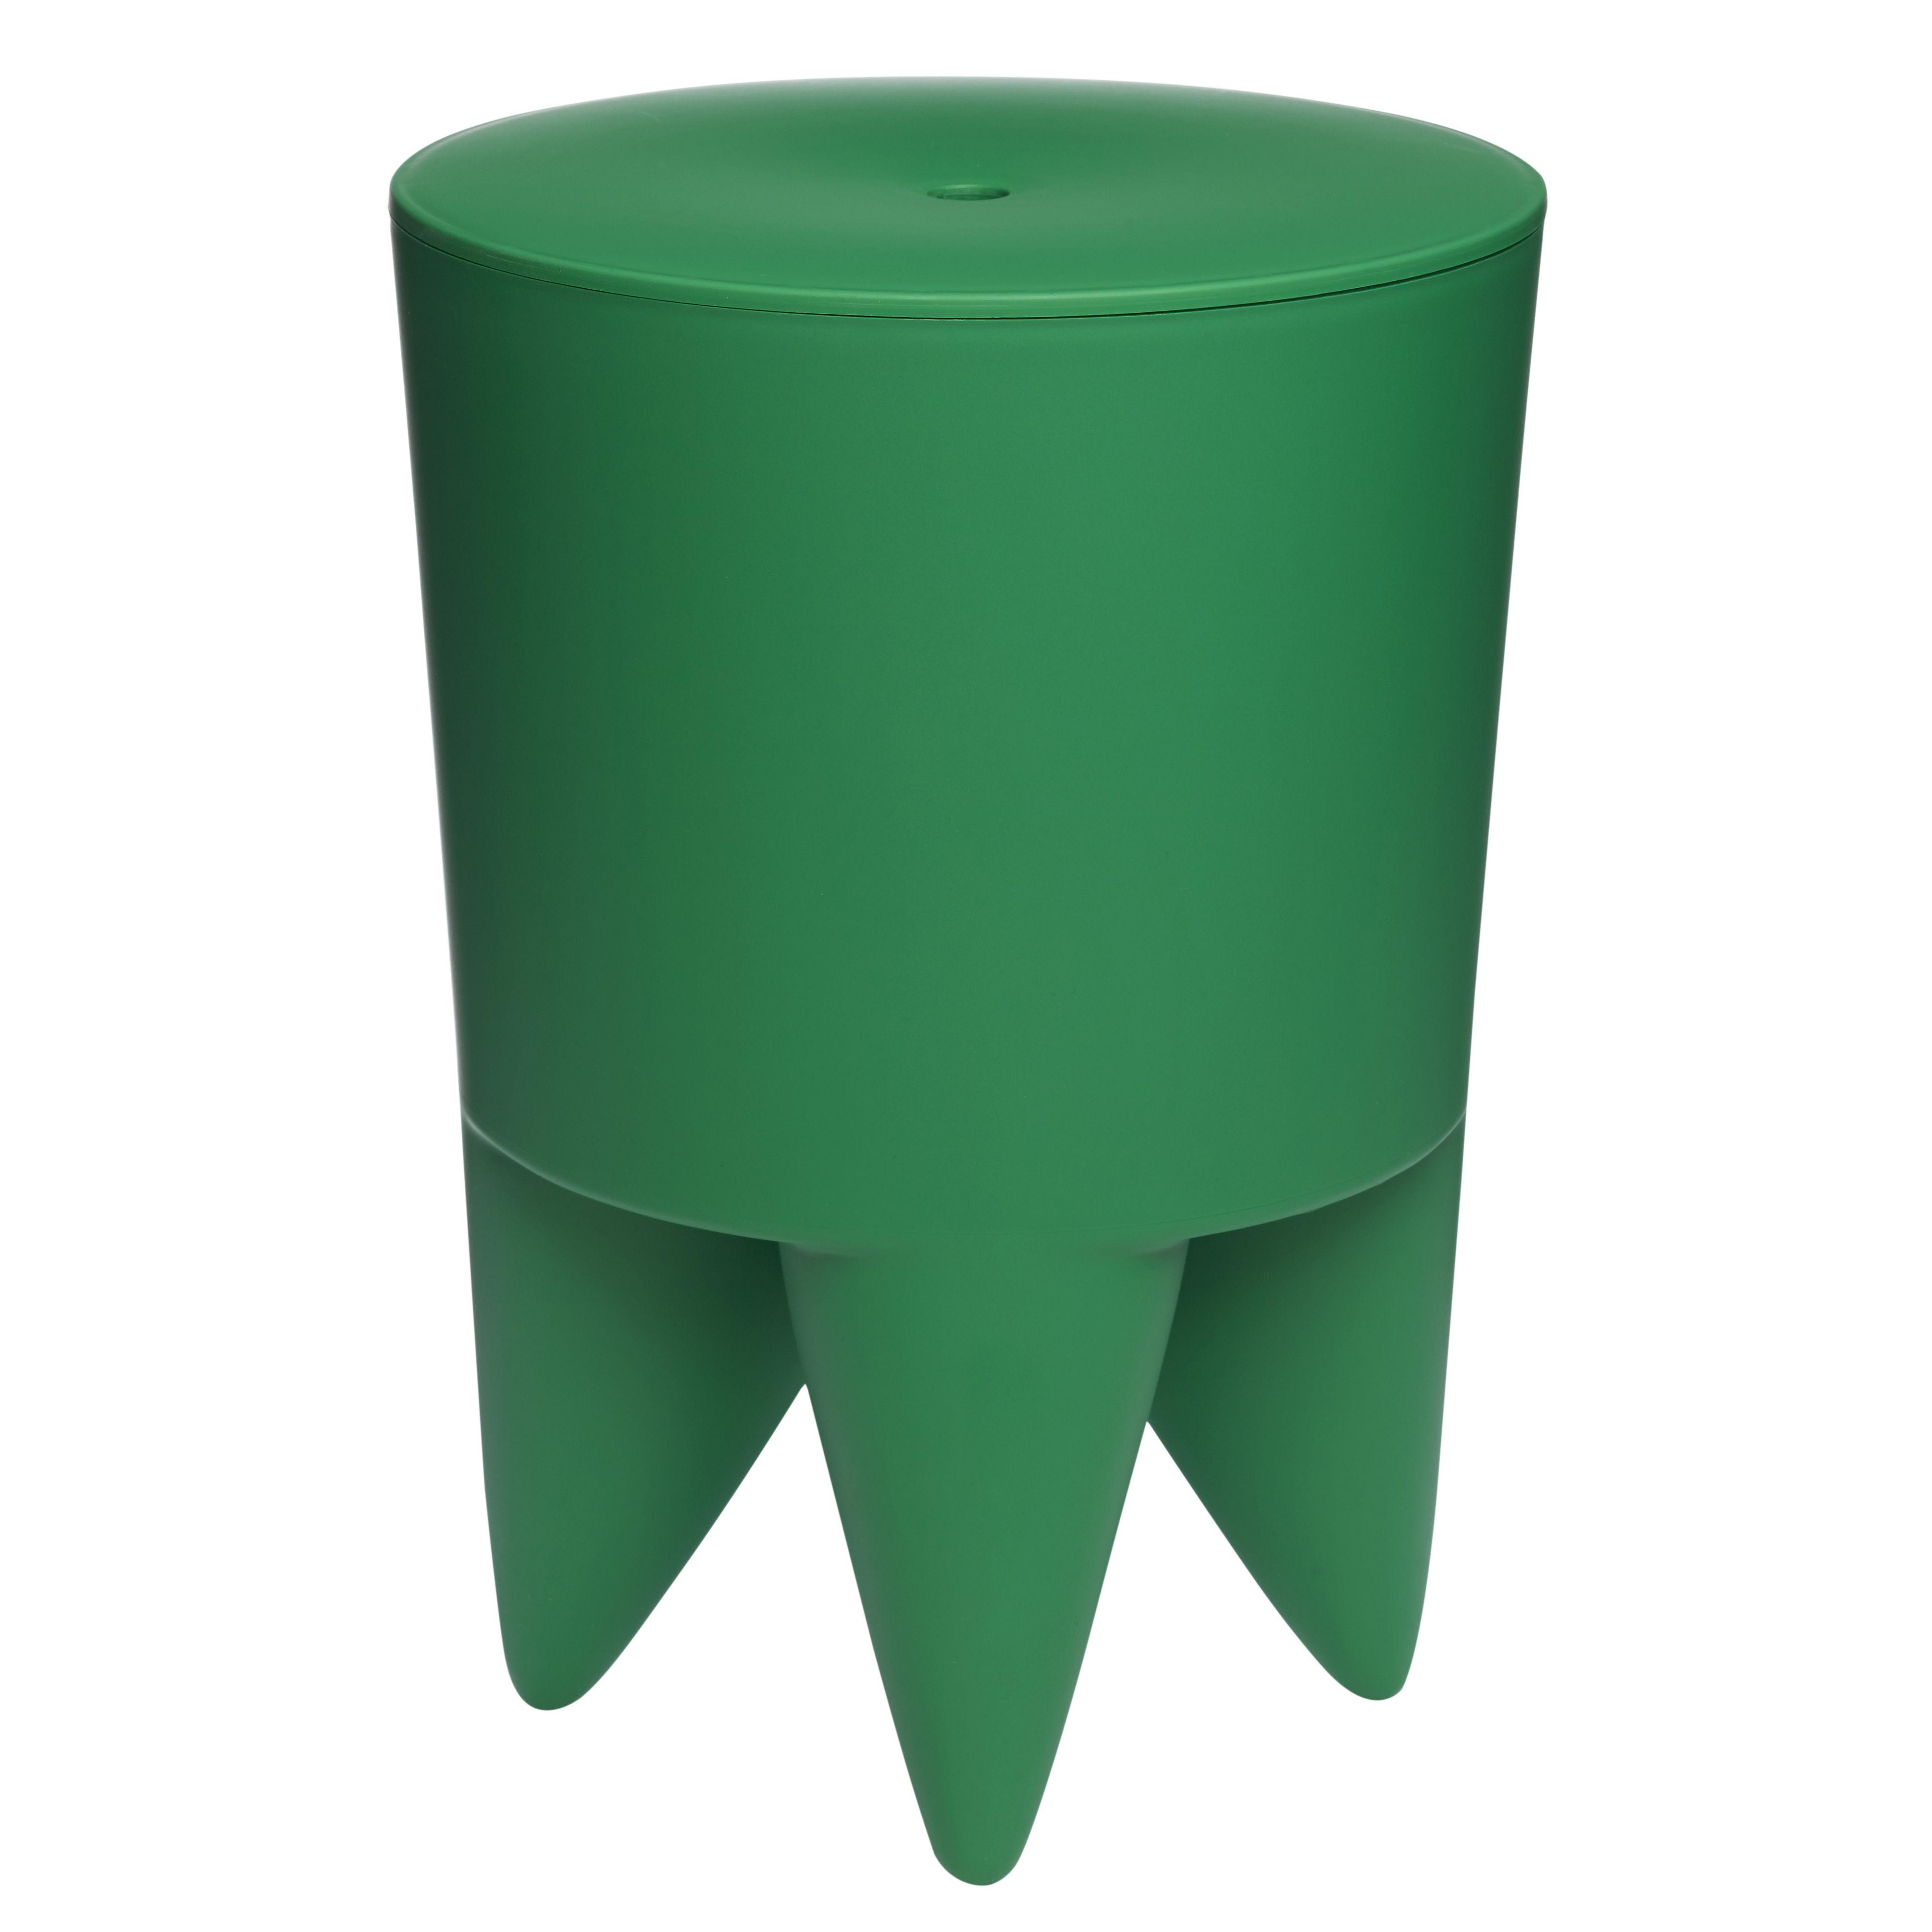 Mobilier - Tabourets bas - Tabouret BUBU 1er / Coffre - Plastique - XO - Vert émeraude - Polypropylène